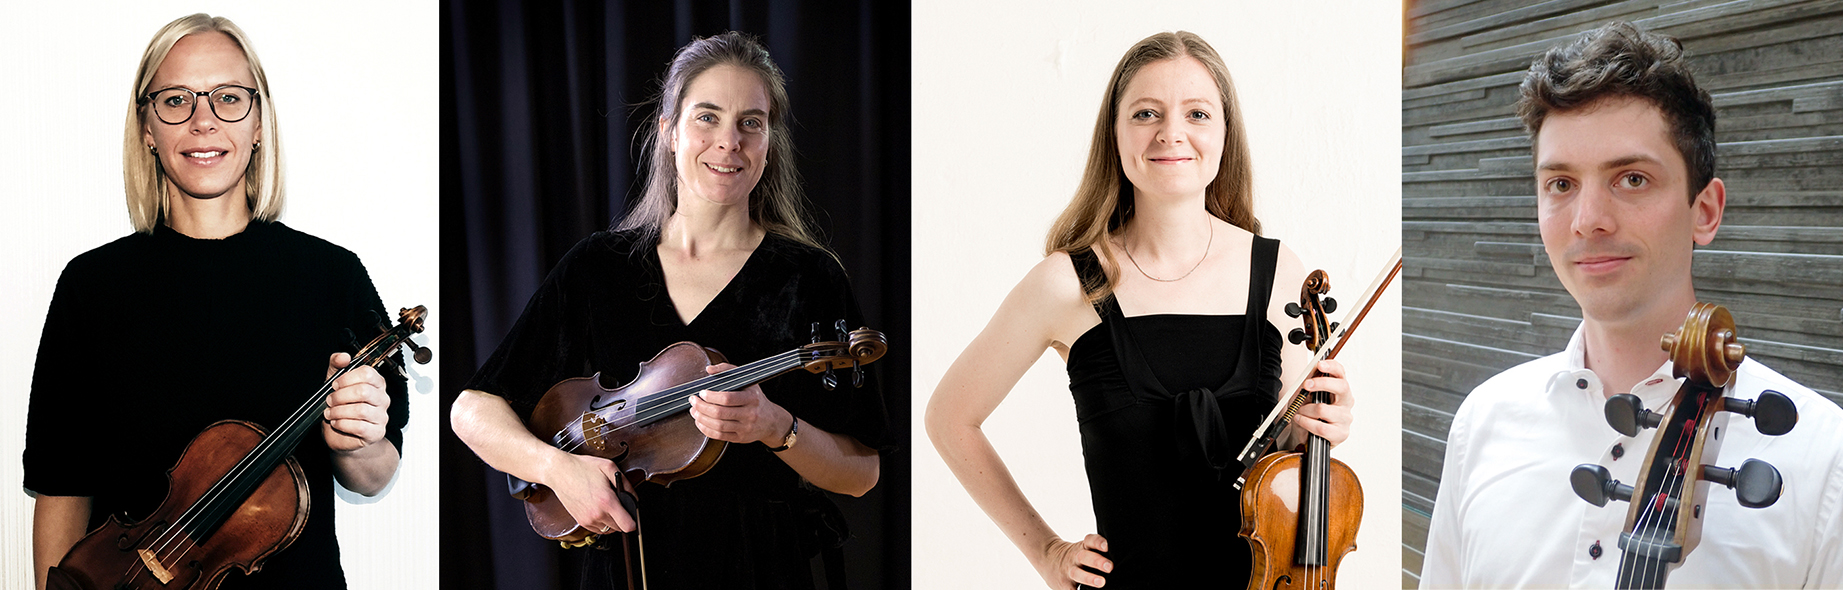 Skolkonsert för Helsingborgs Kulturskola med en stråkkvartett ledd av Emma Dencker - Tisdag 16 november 18.00 Konsertsalen, Dunkers kulturhus